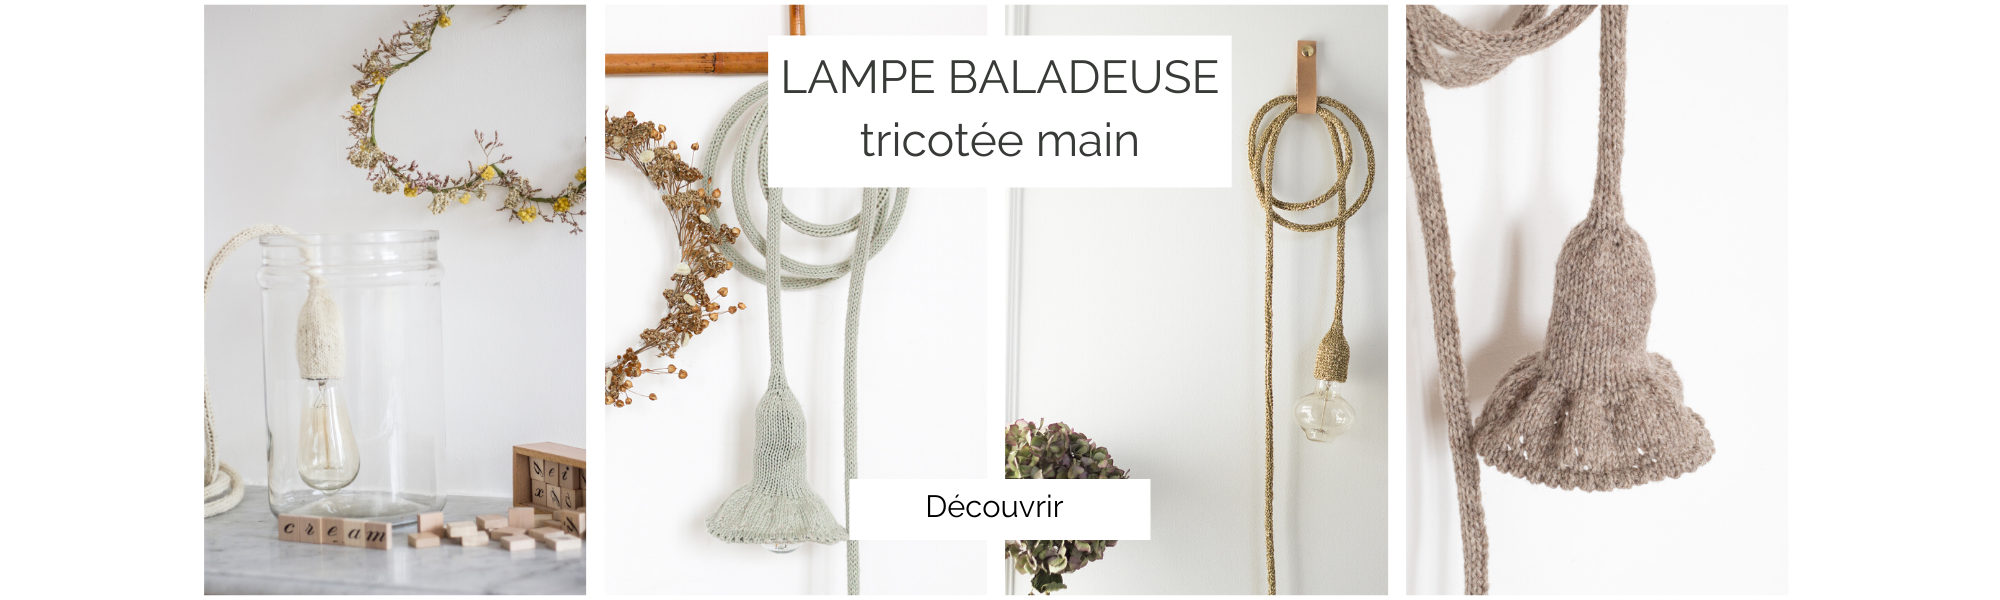 Lampe baladeuse tricotée main, création Trendy Little